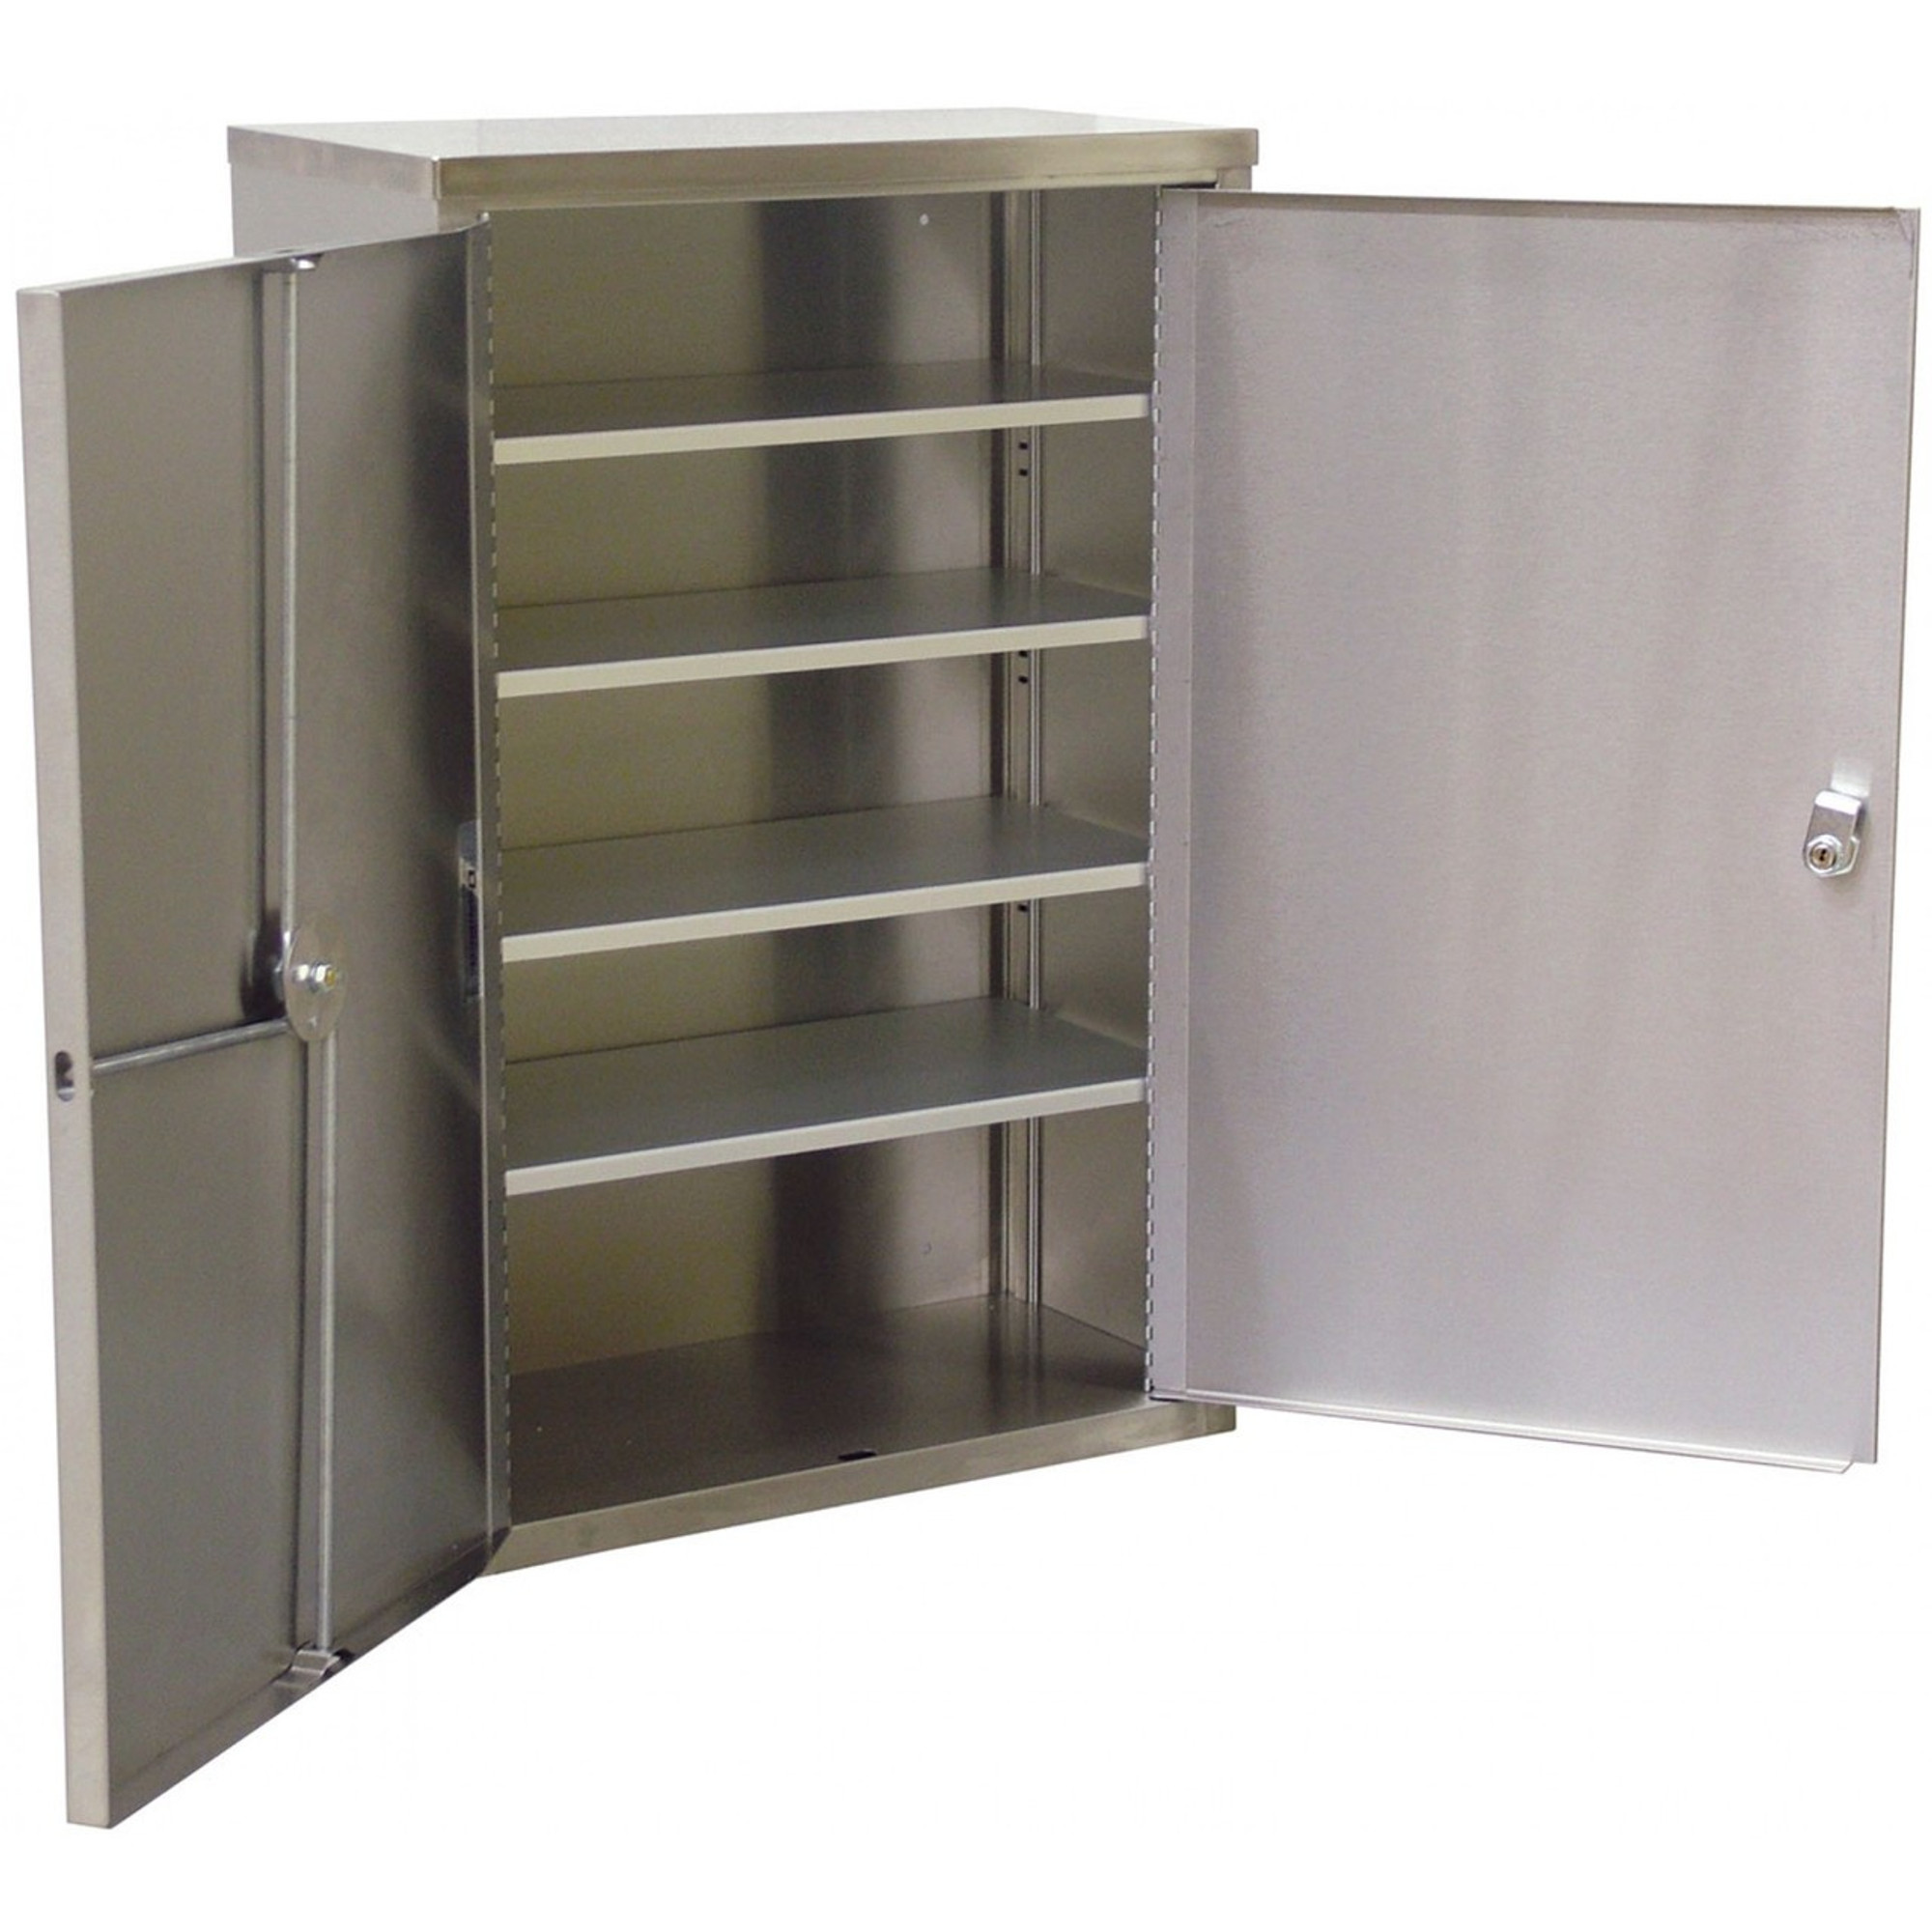 Double Door Narcotic Cabinet W 4 Shelves 24 H X 16 W X 8